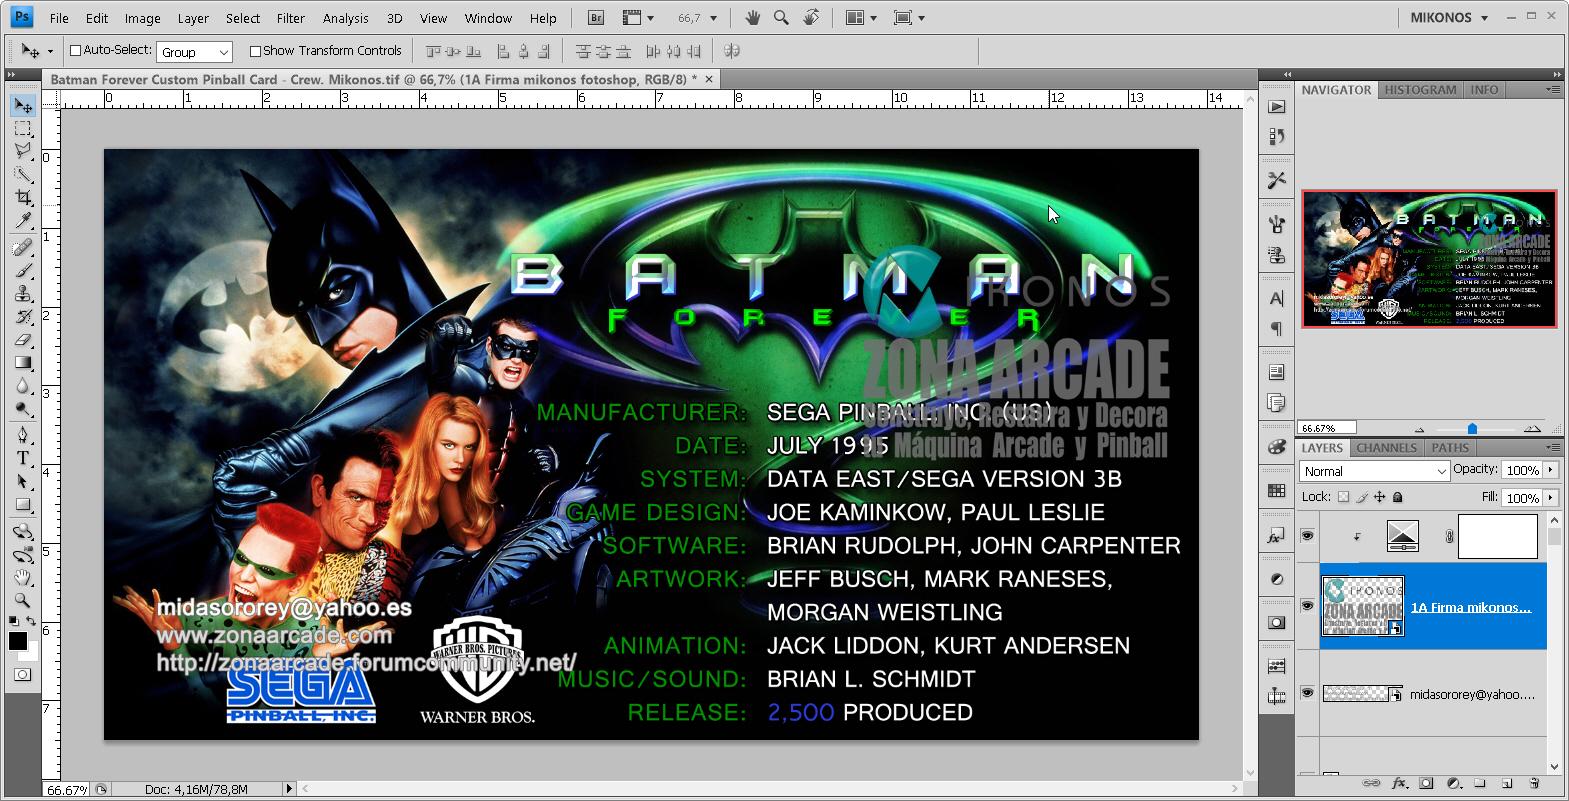 Batman%20Forever%20Custom%20Pinball%20Card%20-%20Crew.%20Mikonos1.jpg